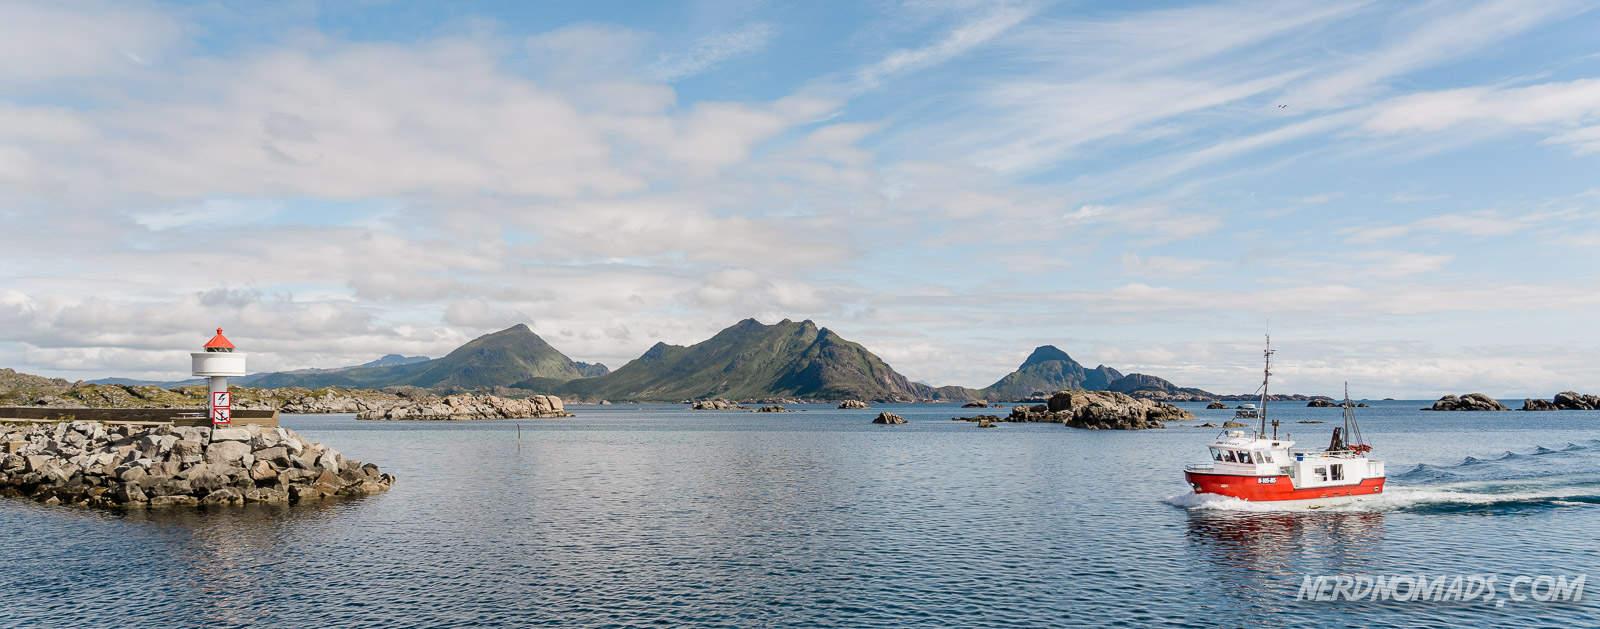 Fishing boat entering Ballstad Lofoten, Norway